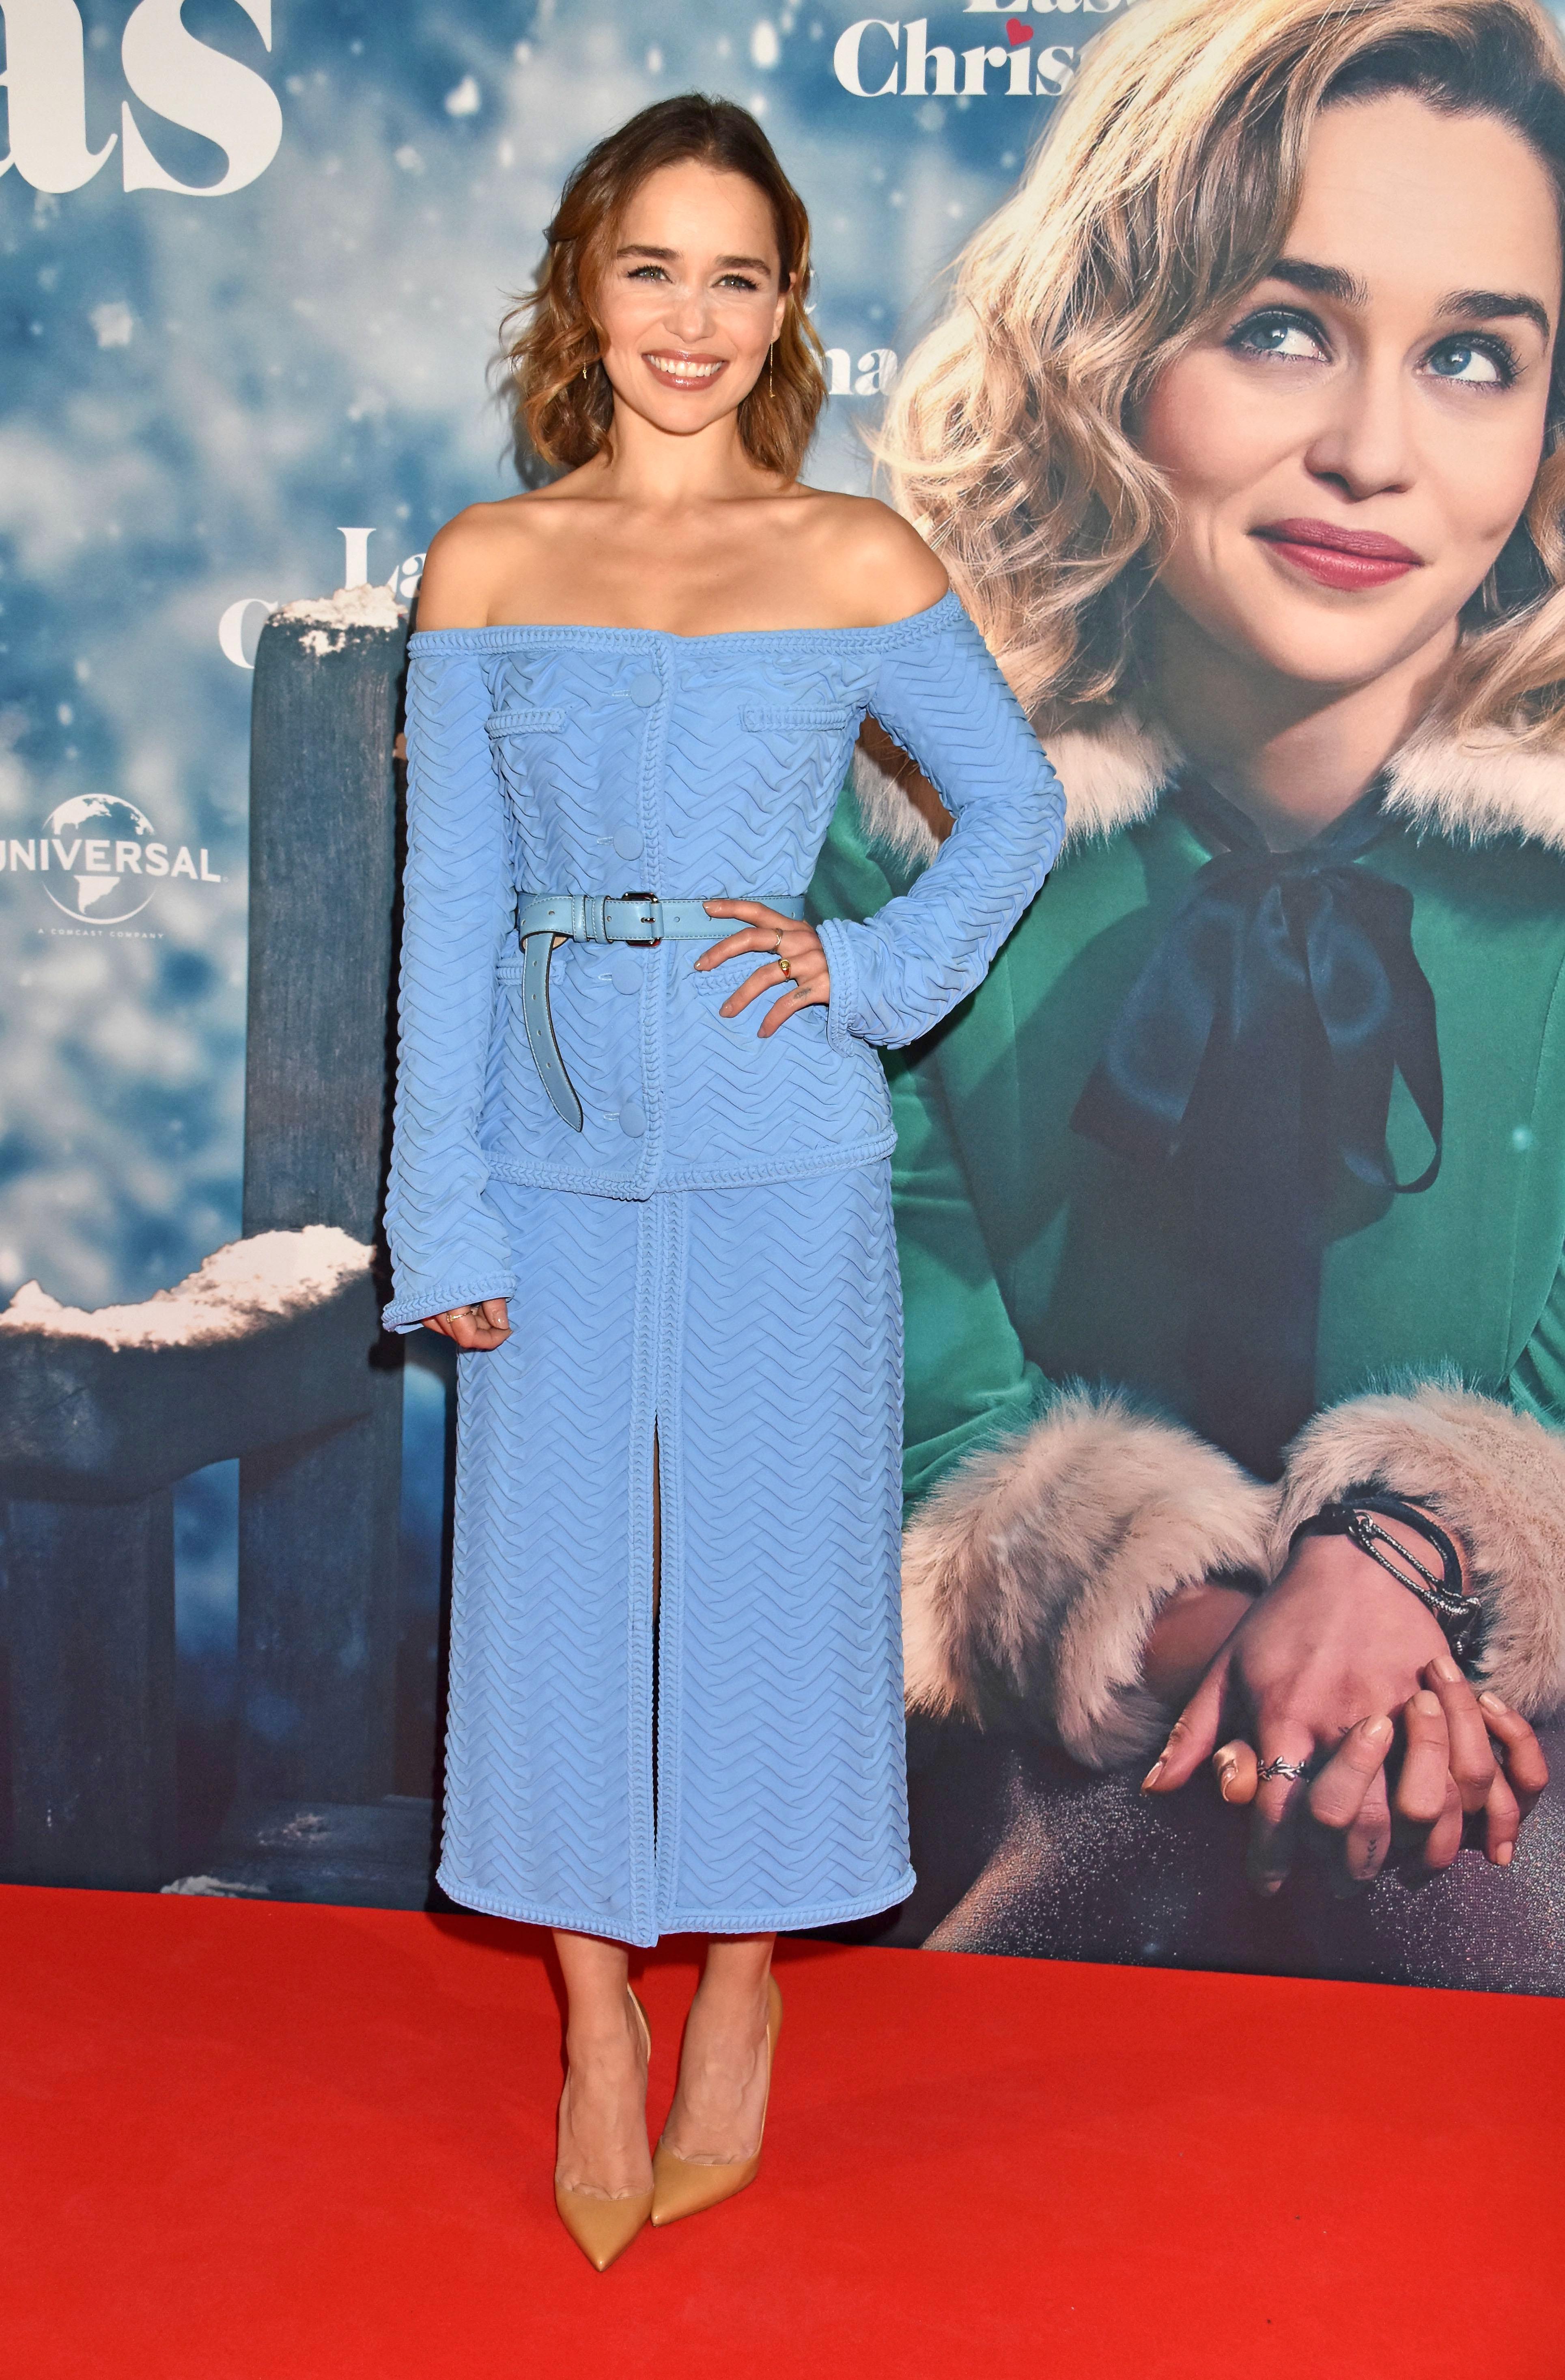 Emilia Clarke, looks